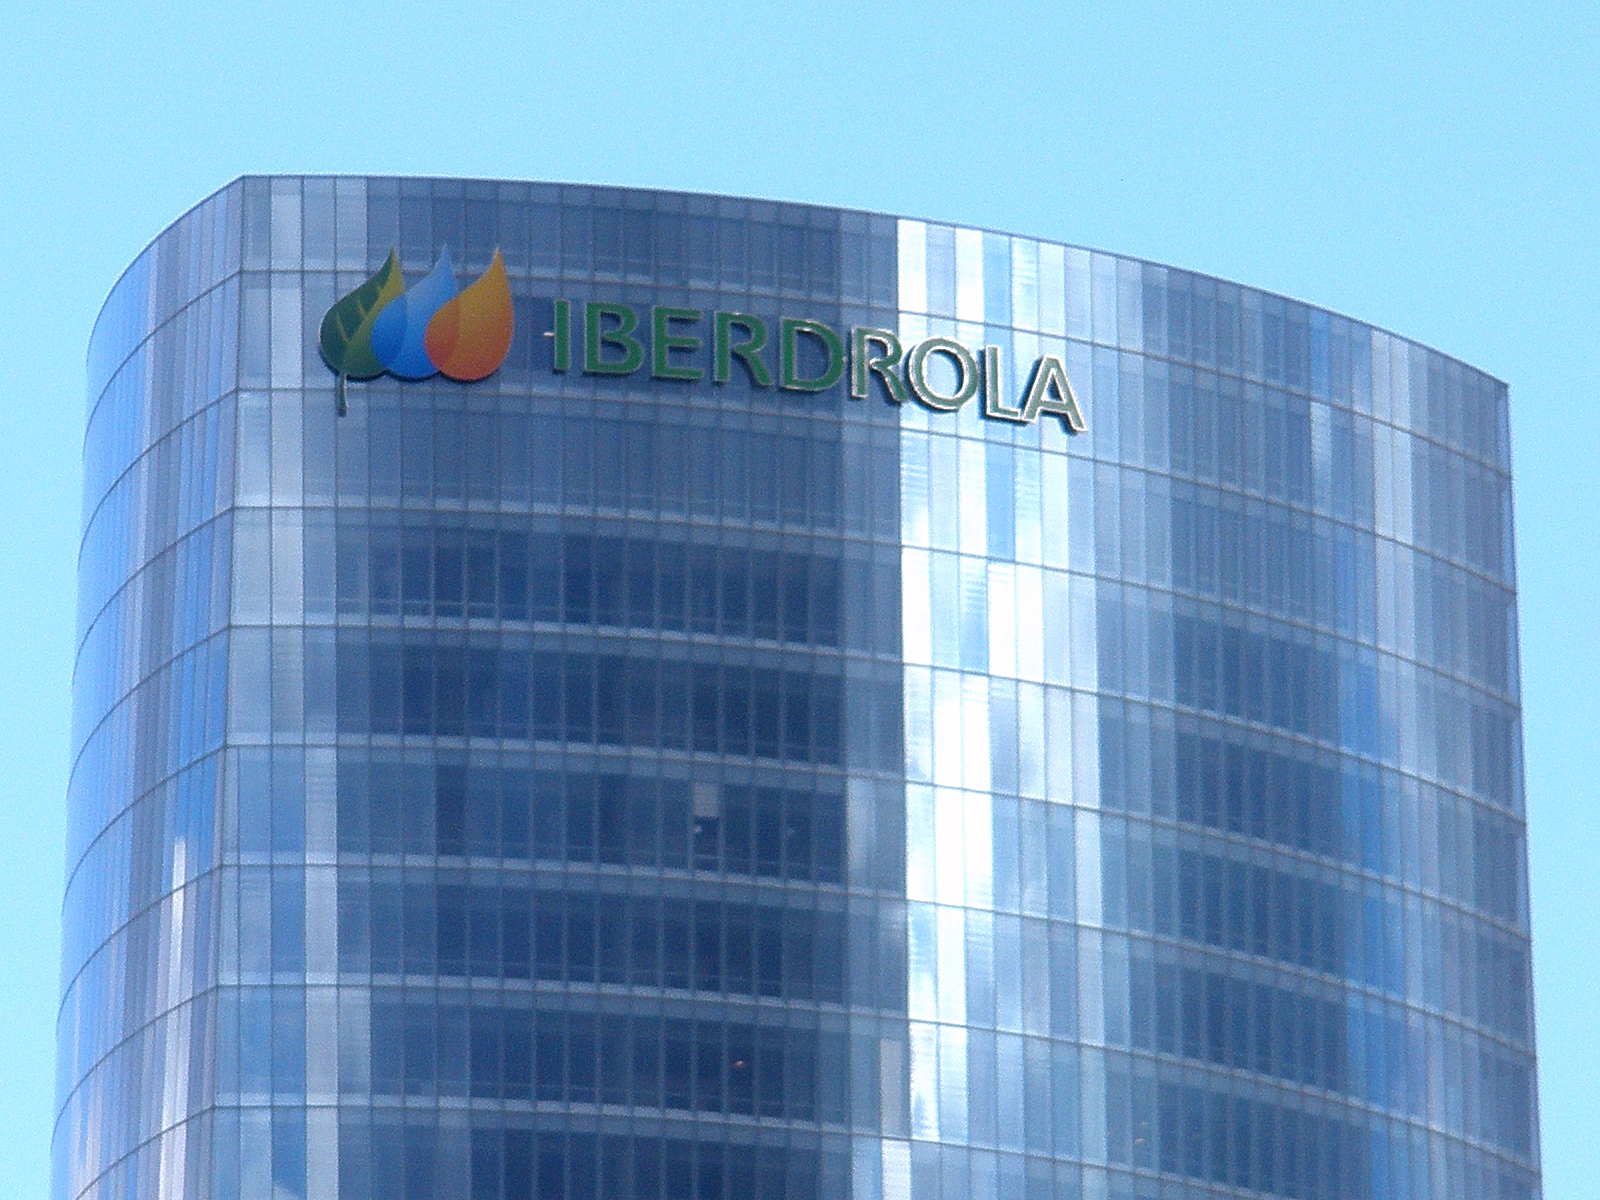 Iberdrola - Wikipedia, la enciclopedia libre